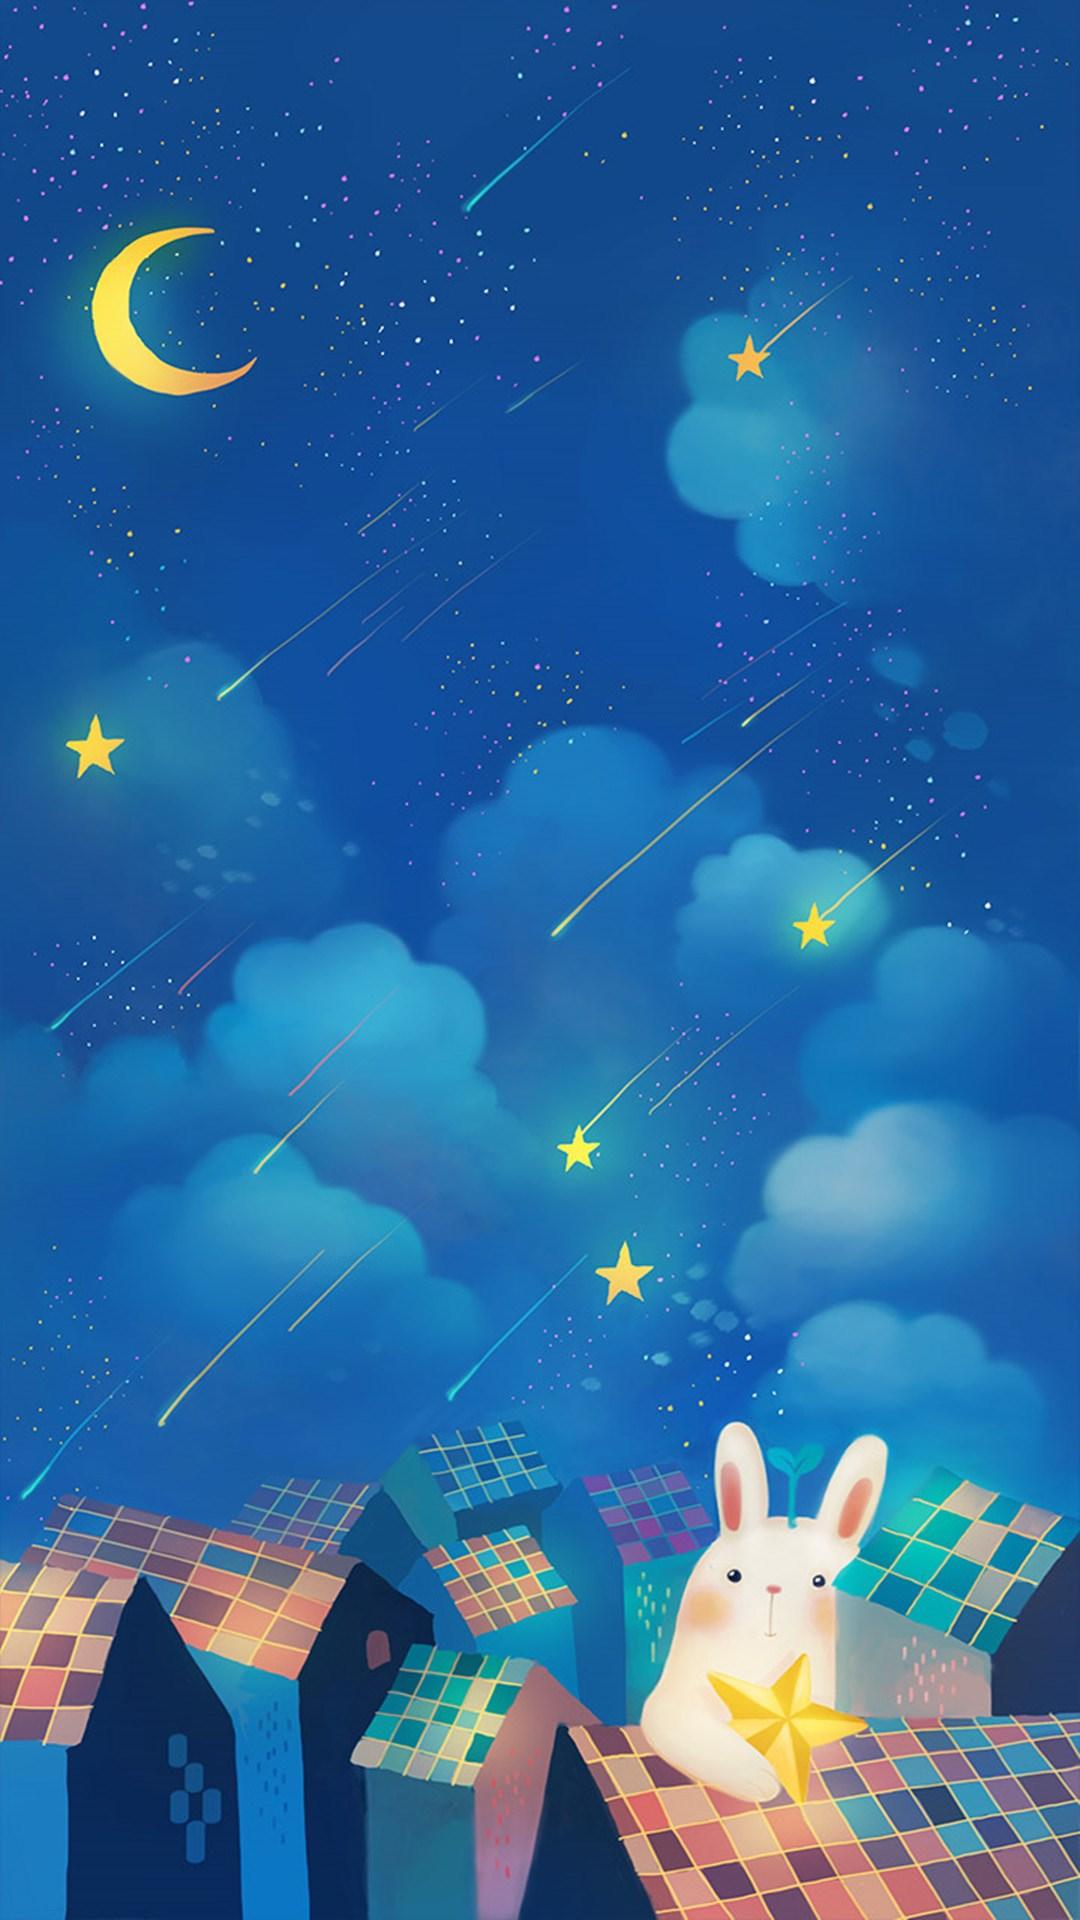 Rabbit Wallpaper Iphone 月夜のイラスト Iphonex スマホ壁紙 待受画像ギャラリー